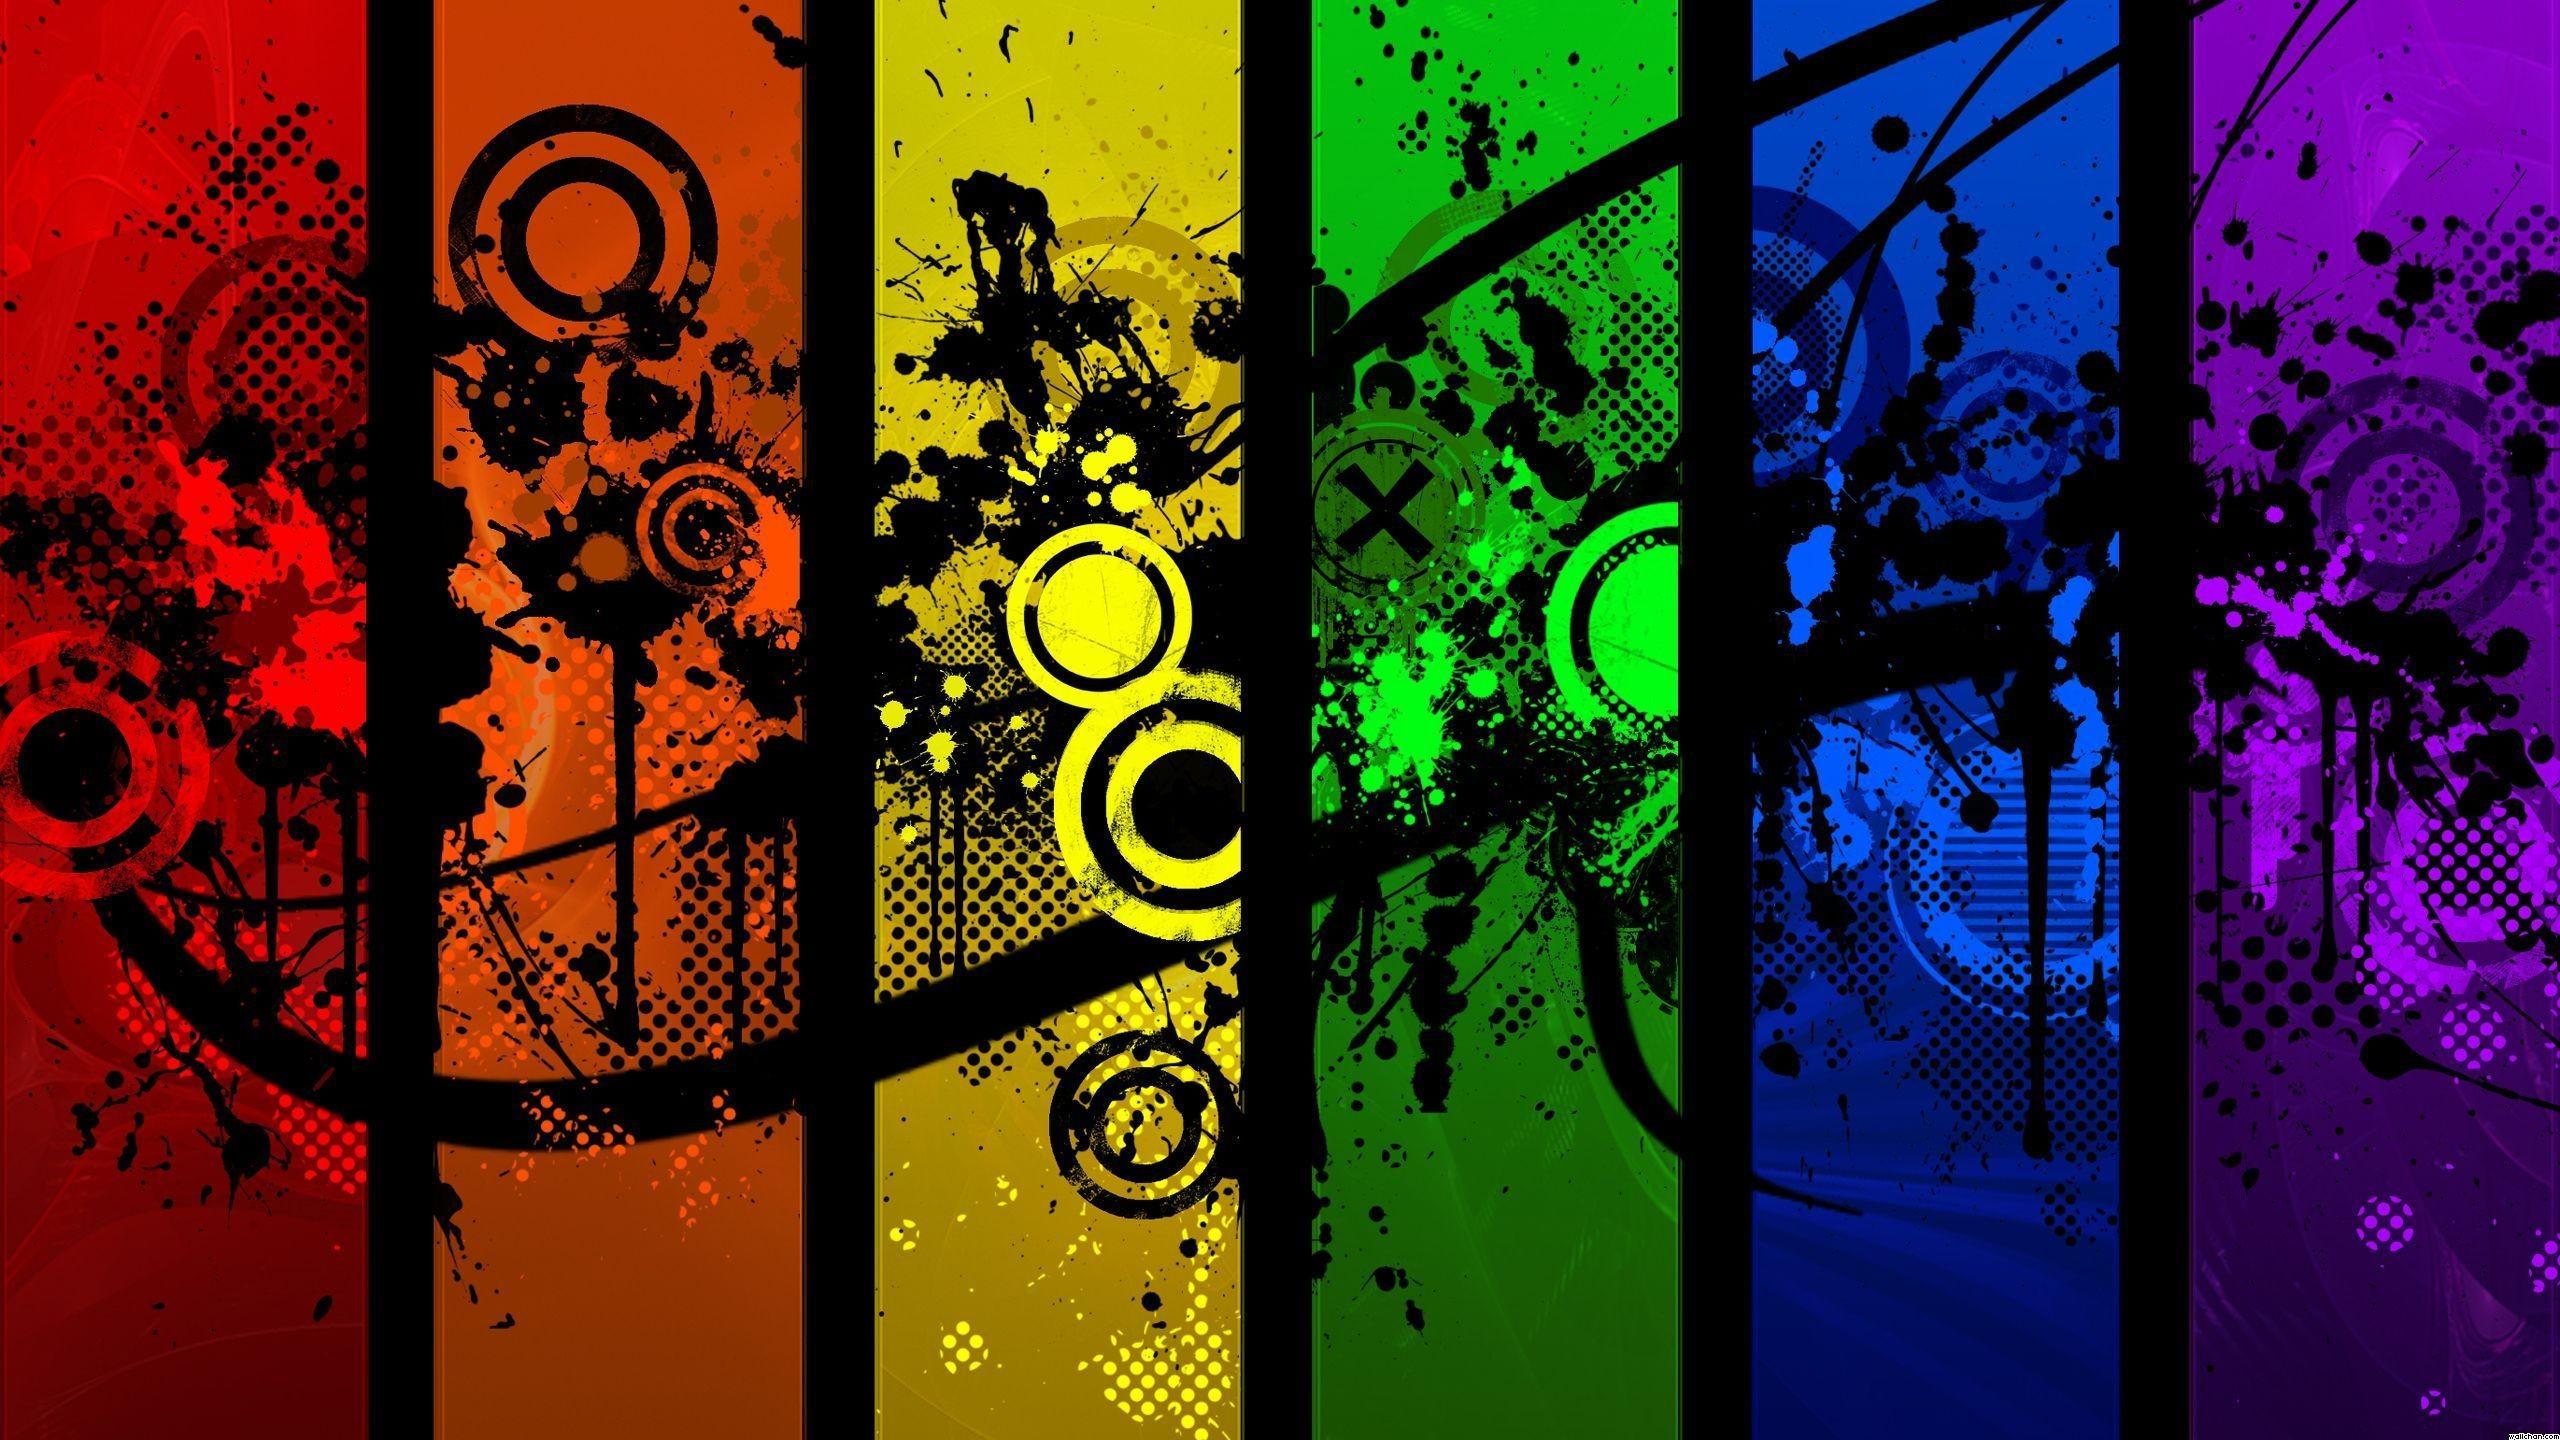 Color Splash Wallpaper Hd 77 Images